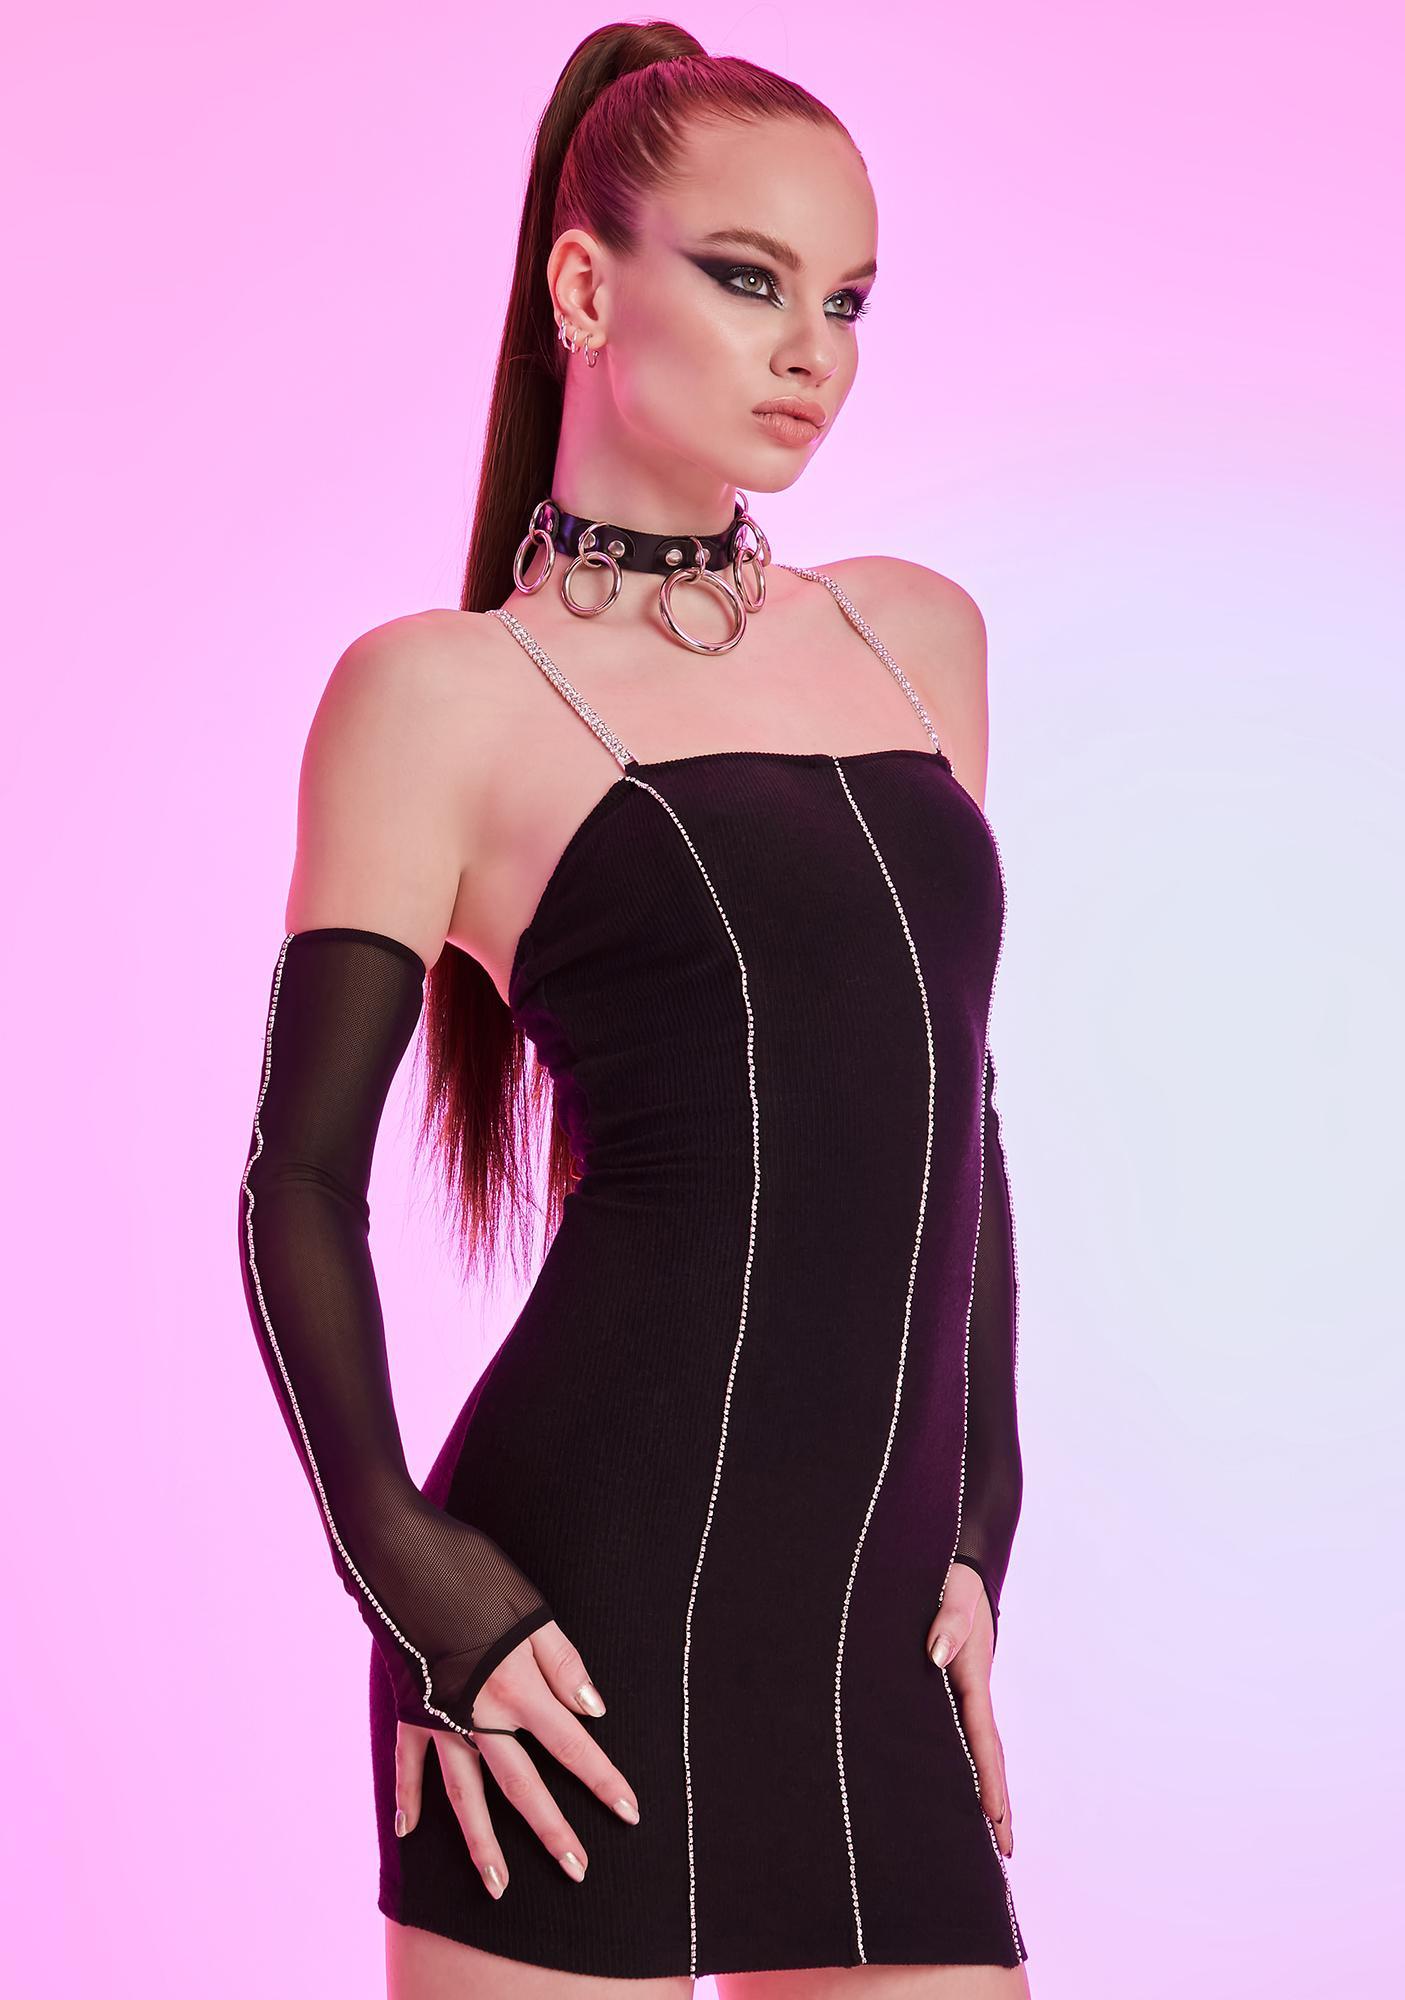 HOROSCOPEZ Seeking Ambitions Rhinestone Mesh Dress Set